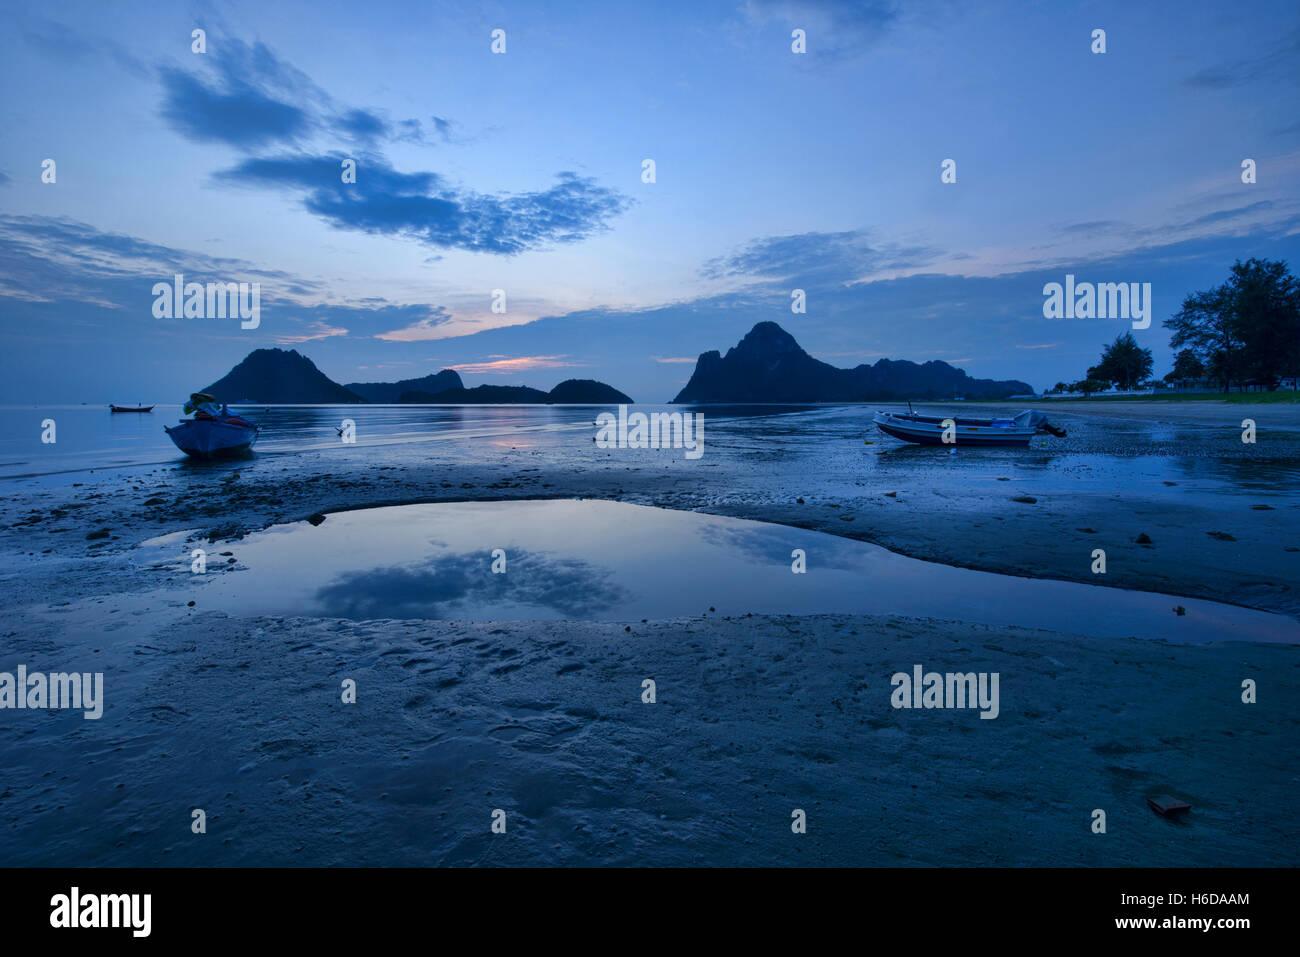 The Gulf of Thailand at blue hour, Prachuap Khiri Khan, Thailand - Stock Image